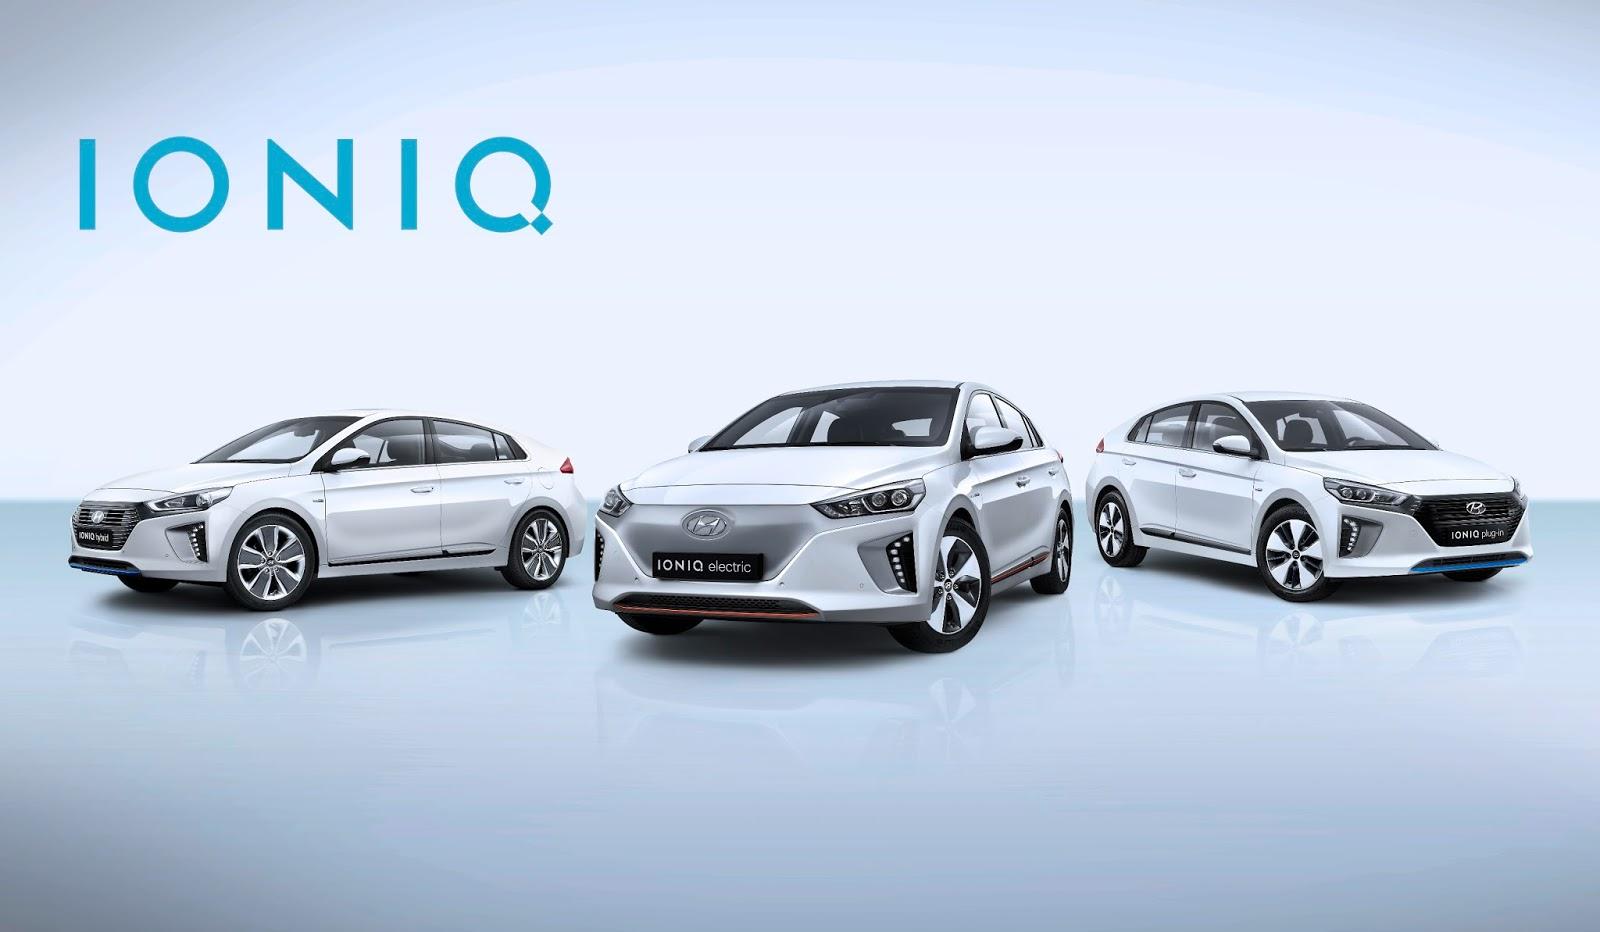 All New%2BIONIQ%2Bline up Η HYUNDAI παρουσιάζει το IONIQ, το πρώτο υβριδικό οχήμα με τρία εναλλακτικά συστήματα ηλεκτροκίνησης